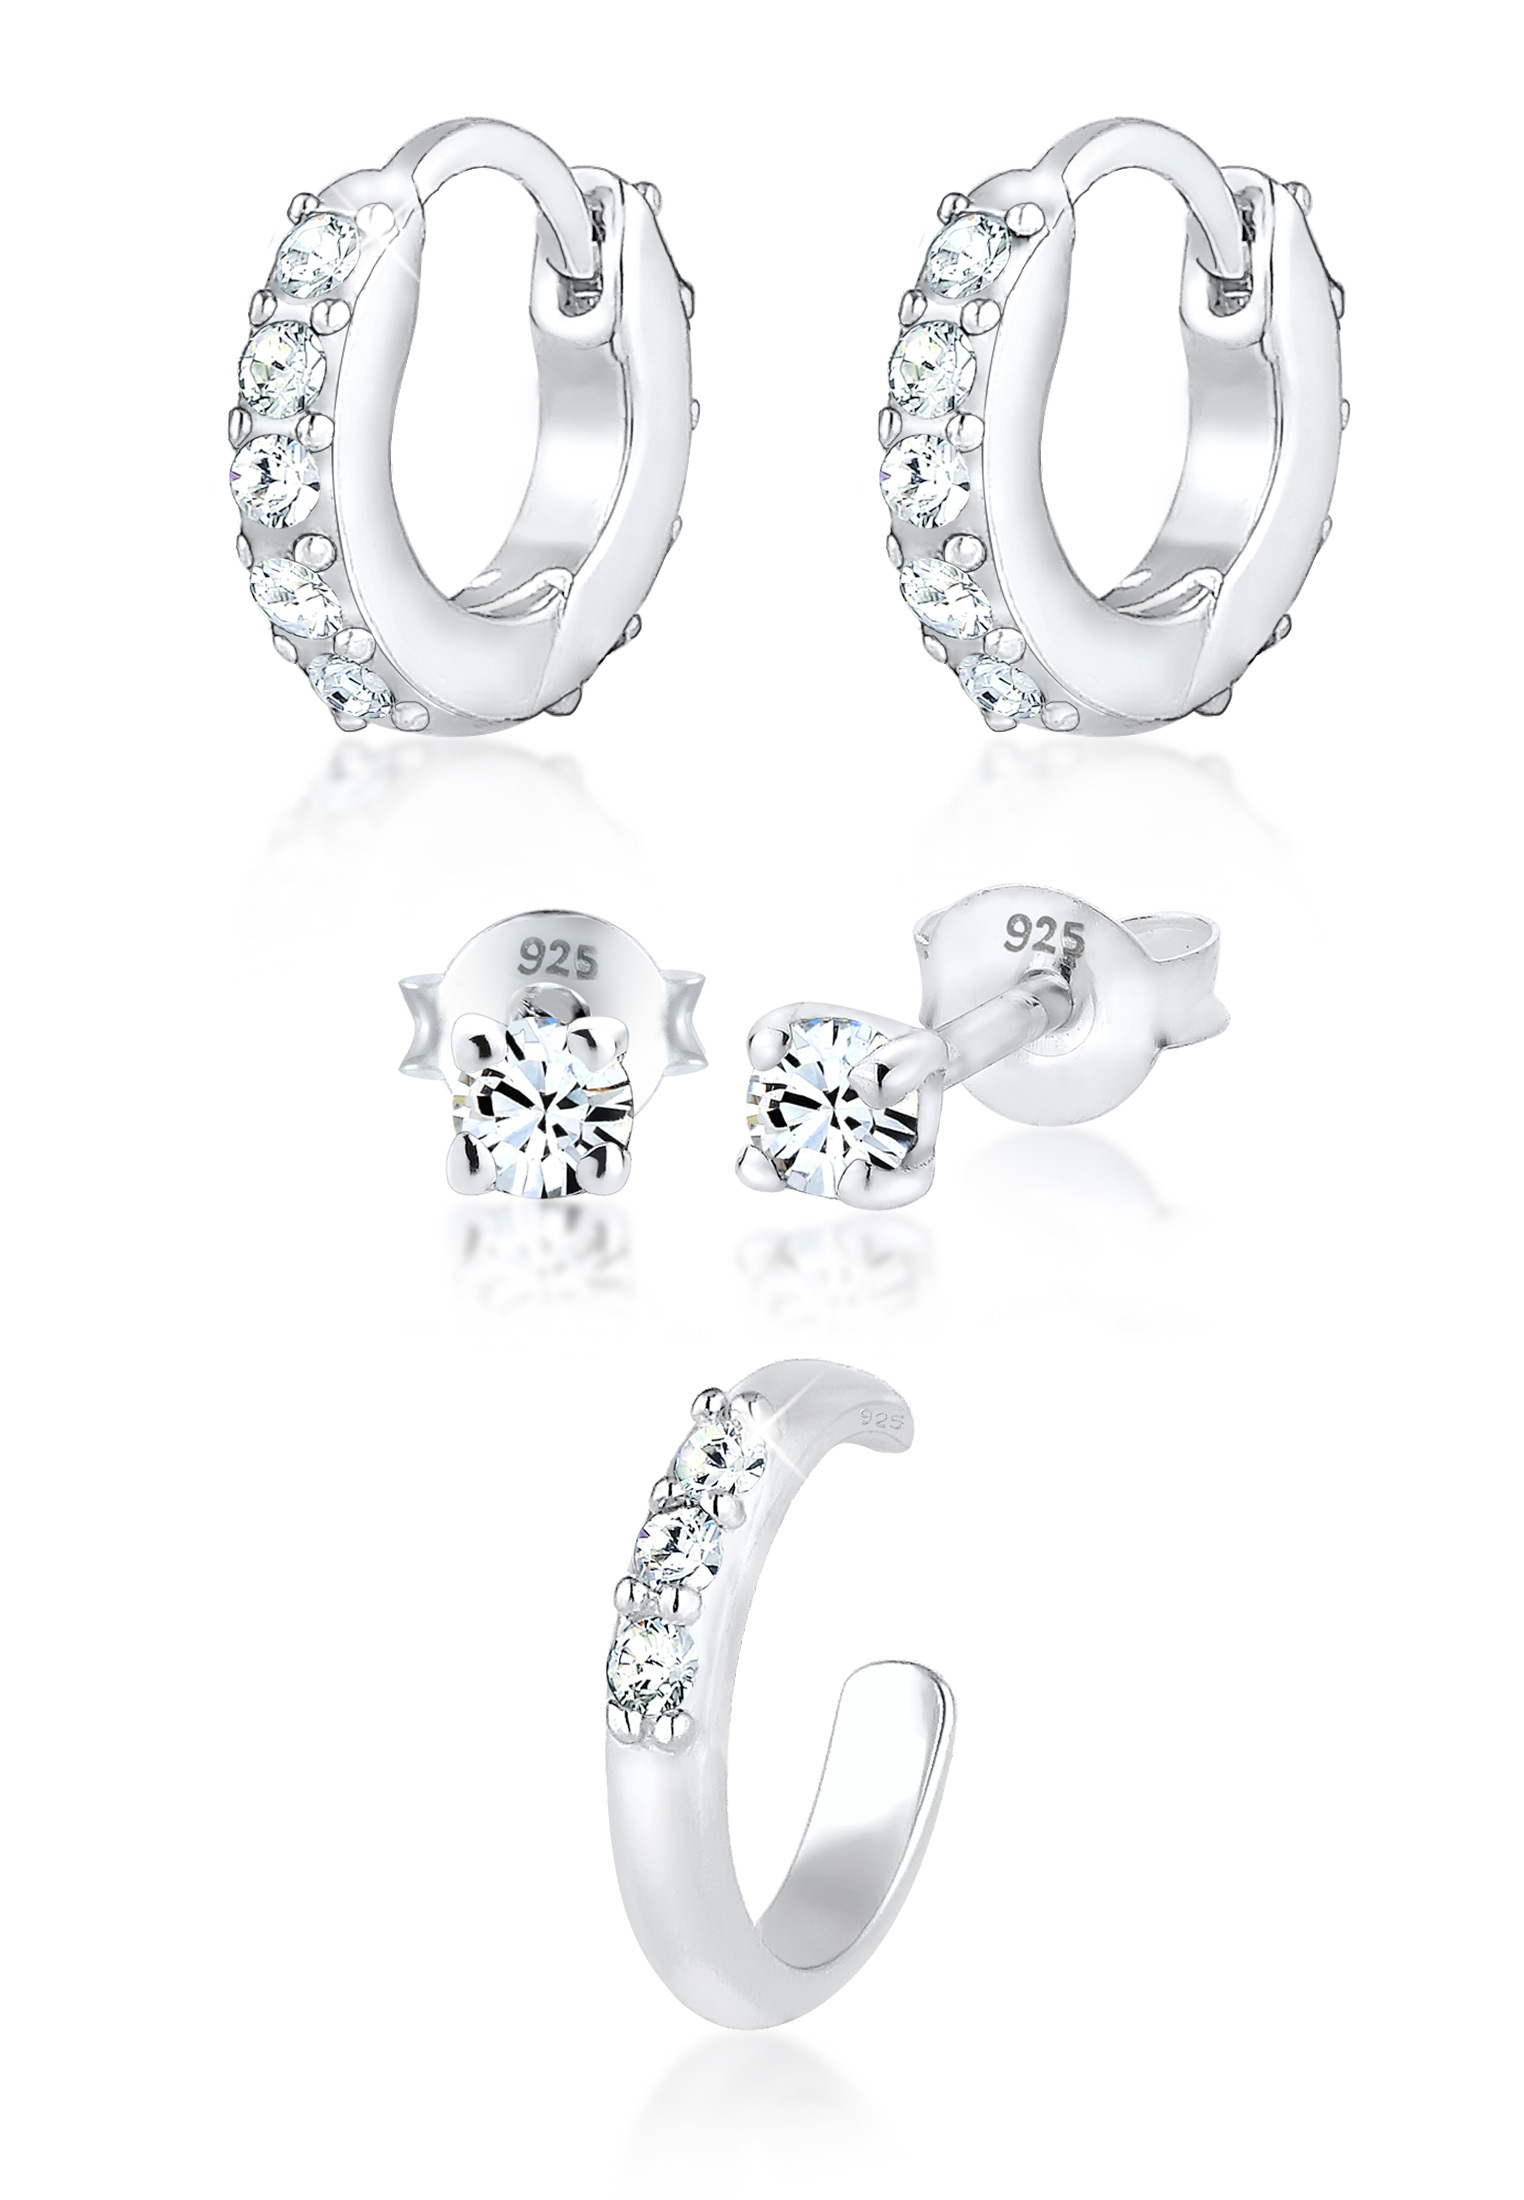 Ohrringset | Kristall ( Weiß ) | 925er Sterling Silber